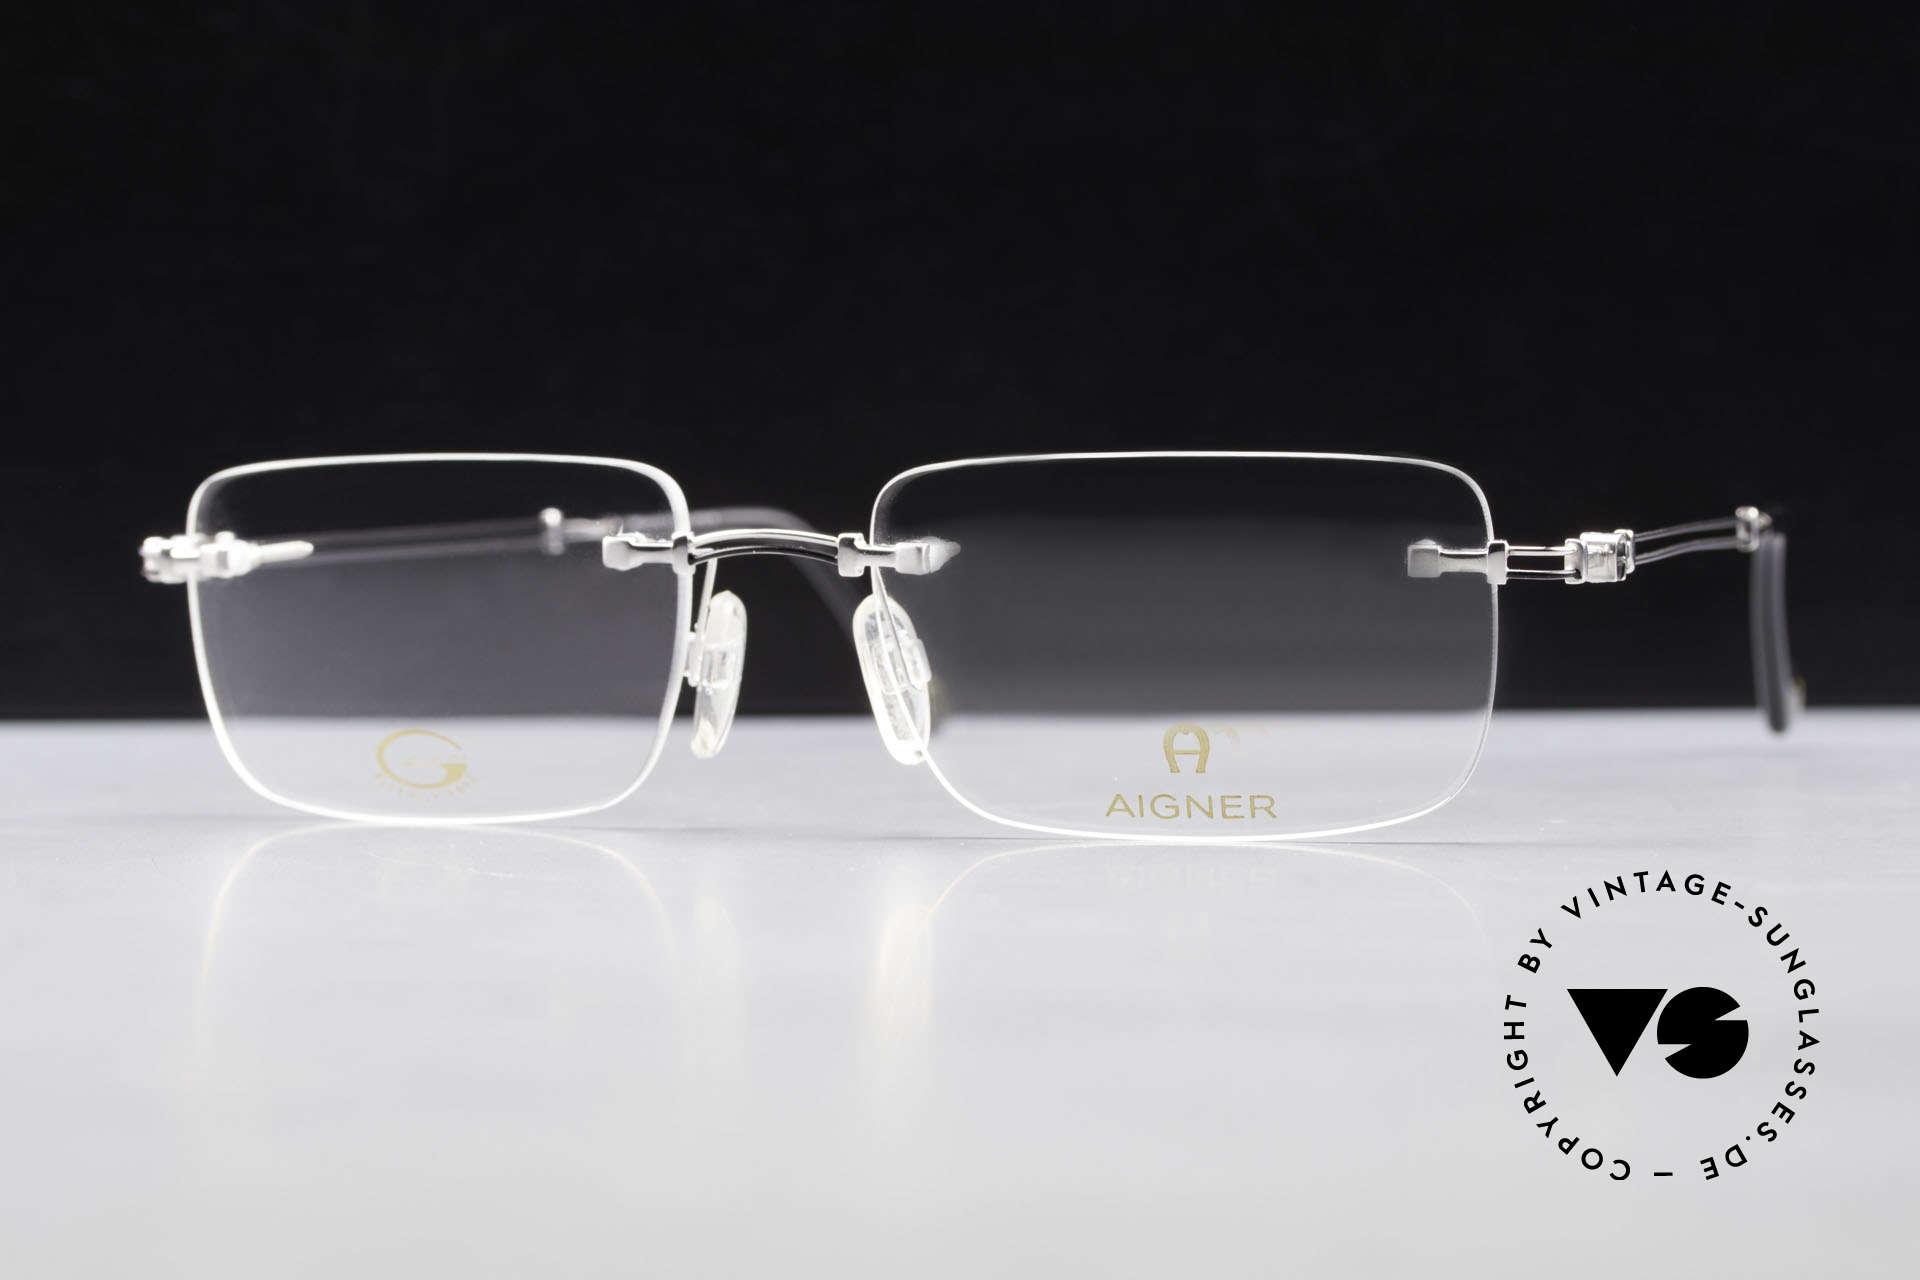 Aigner EA496 Rimless 90's Vintage Glasses, Size: large, Made for Men